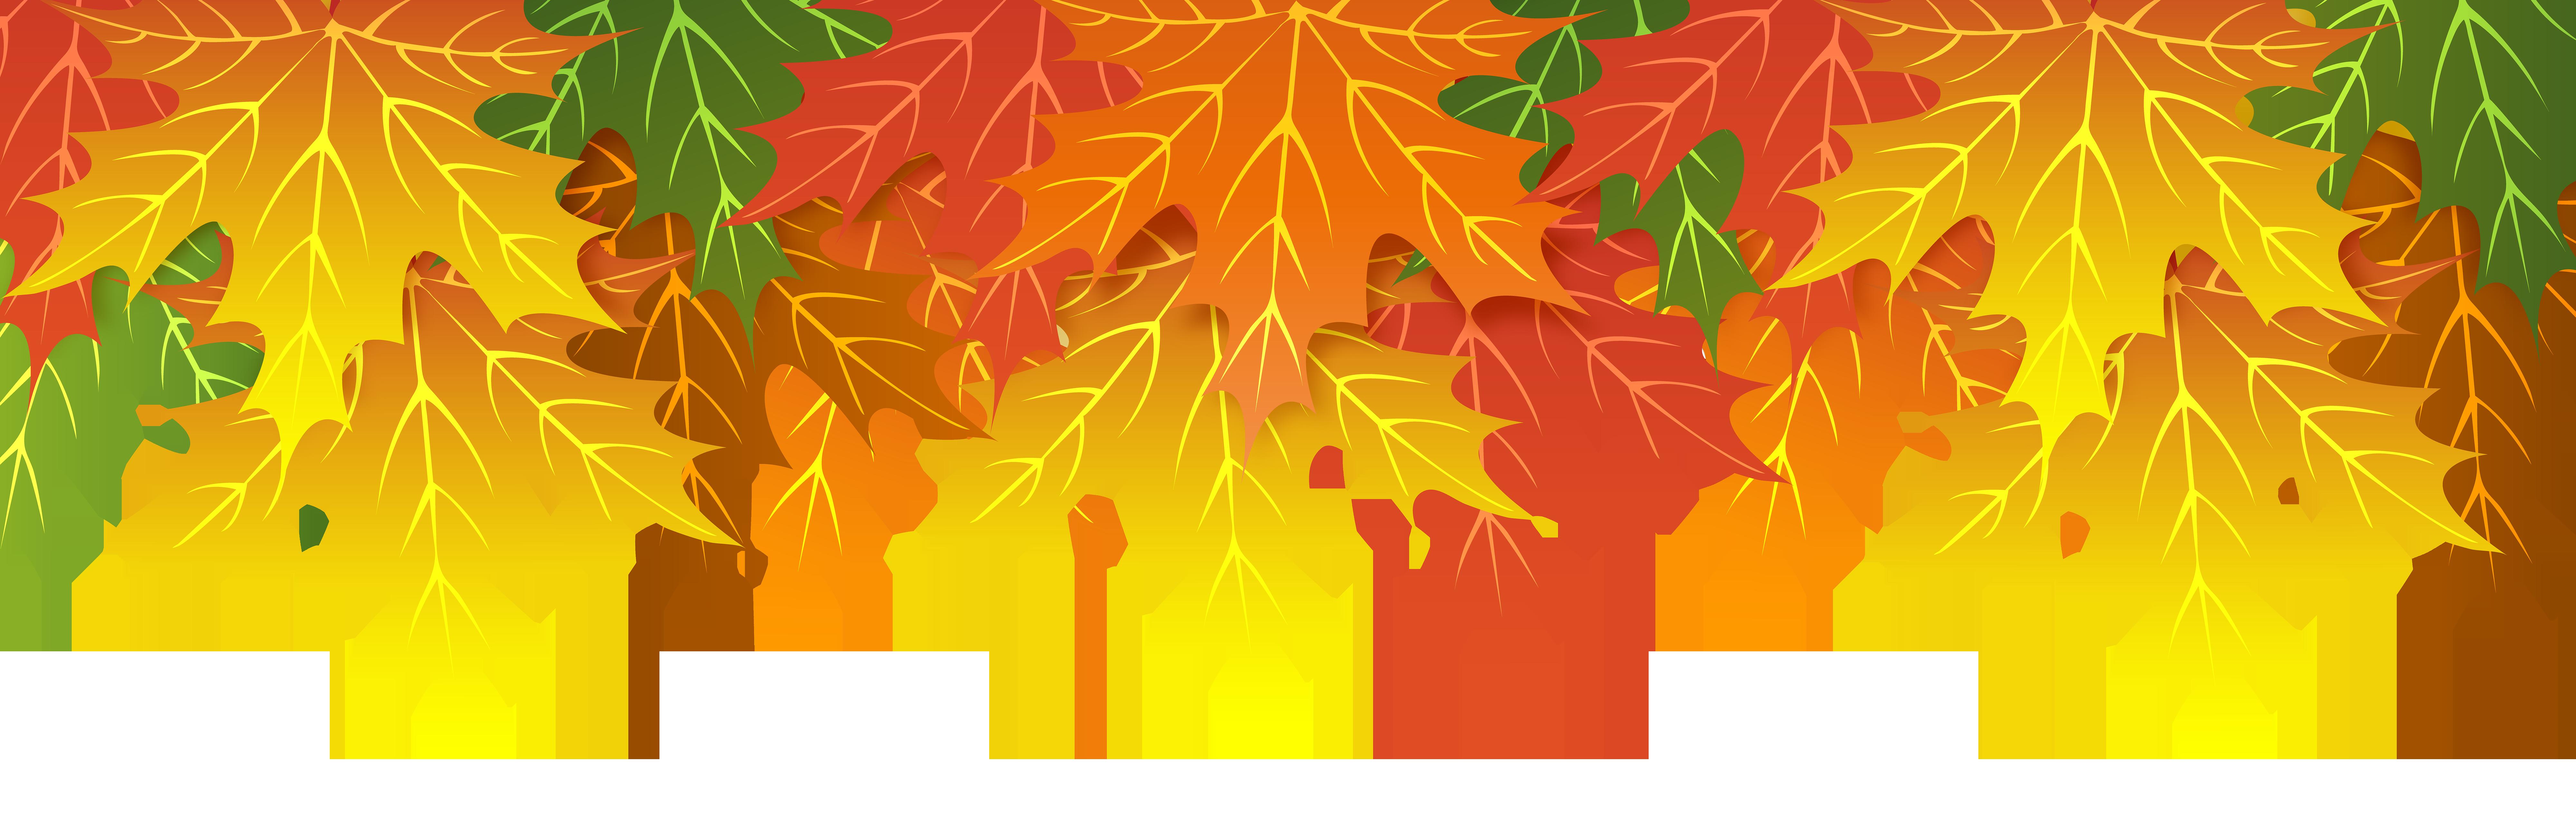 Fall Leaves Upper Border PNG Clip Art Image.